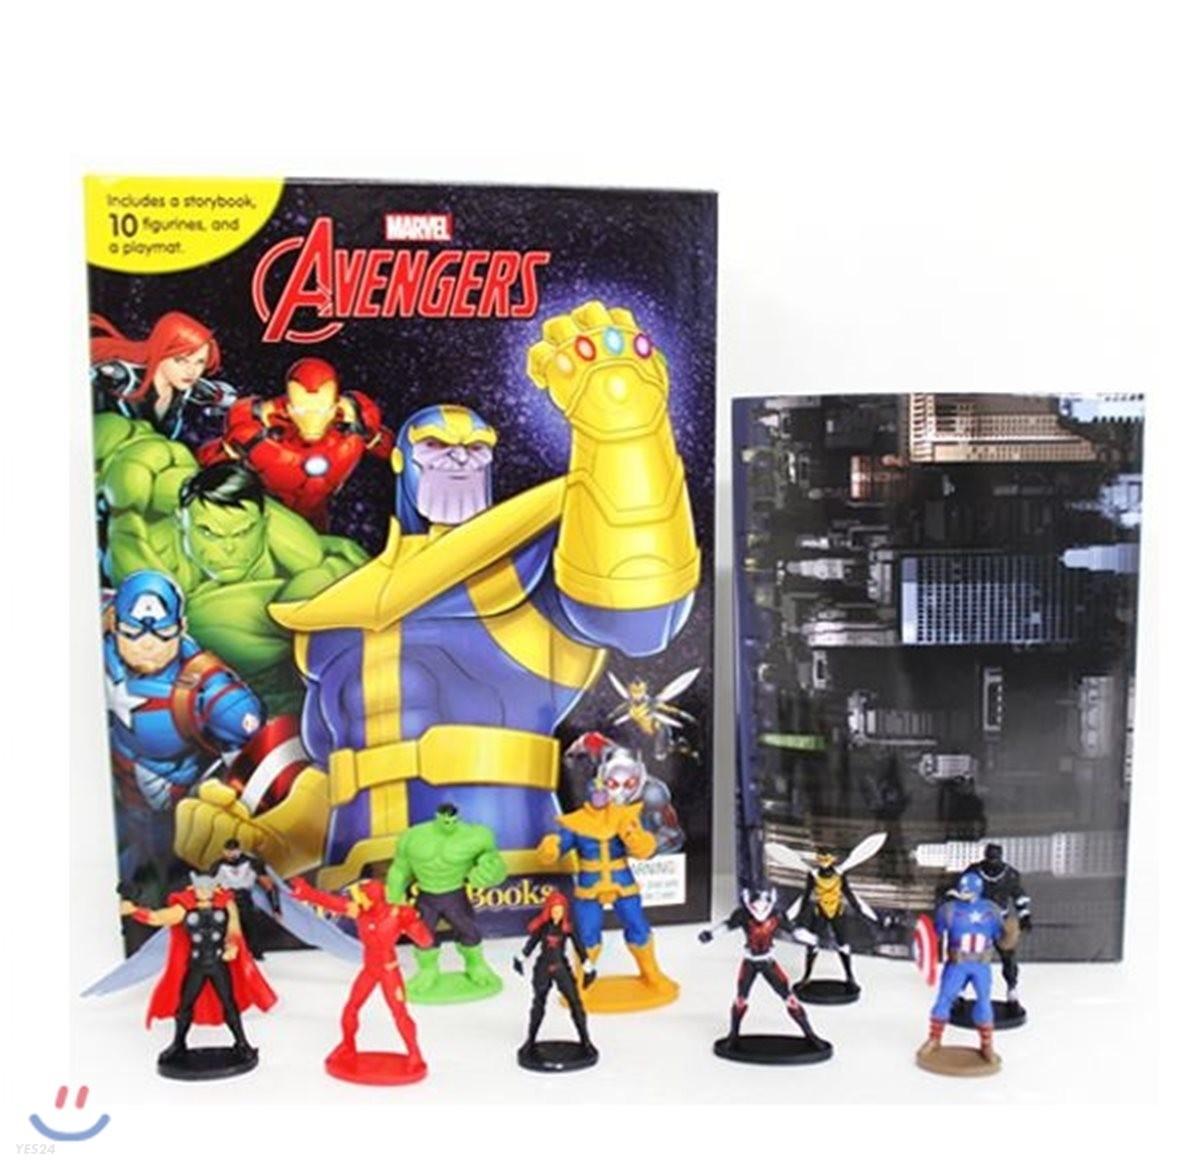 Marvel Avengers Infinity War My Busy Books 리뉴얼 마블 어벤져스 인피니티 워 비지북 피규어책